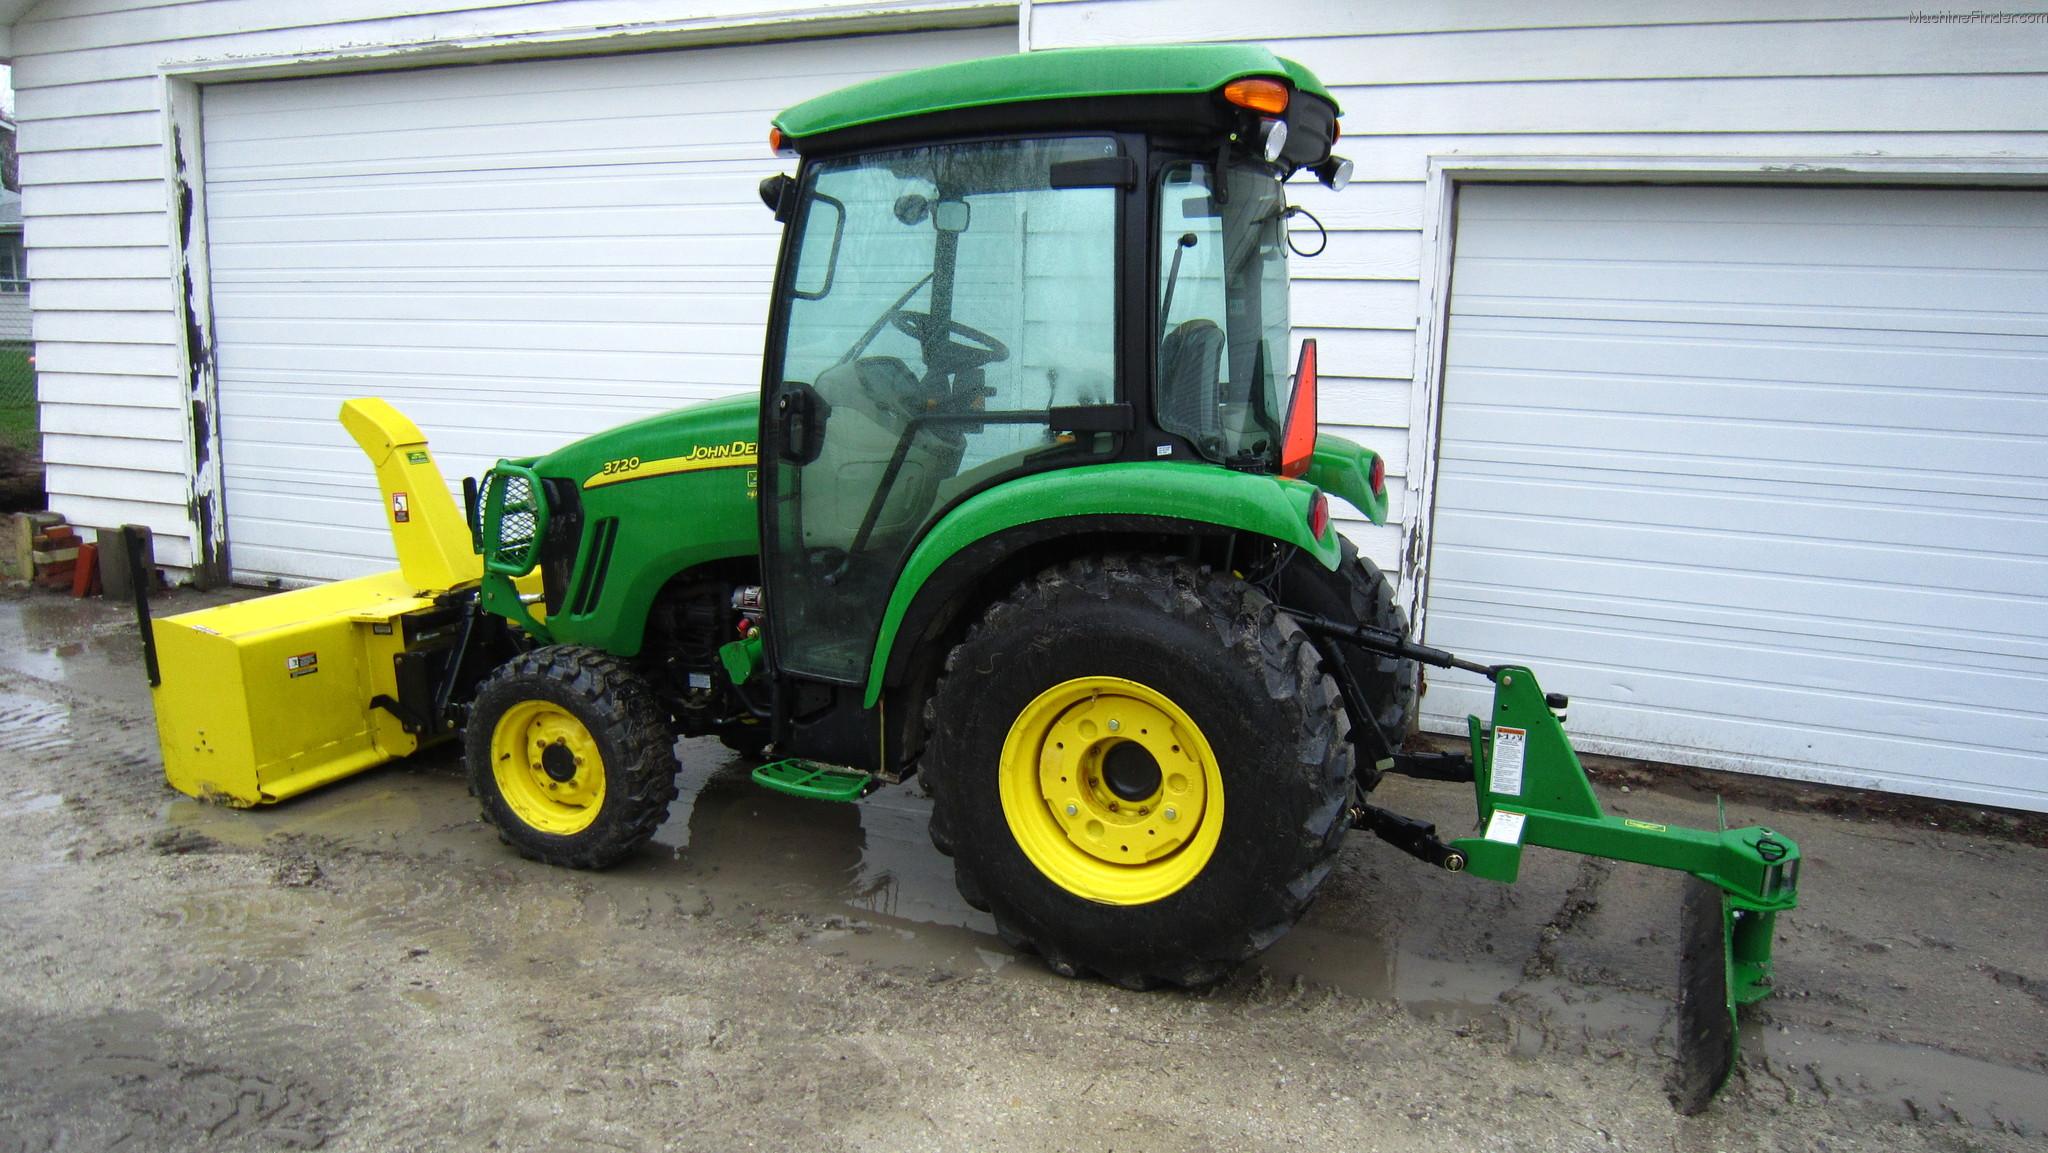 2010 John Deere 3720 Tractors - Compact (1-40hp.) - John ...